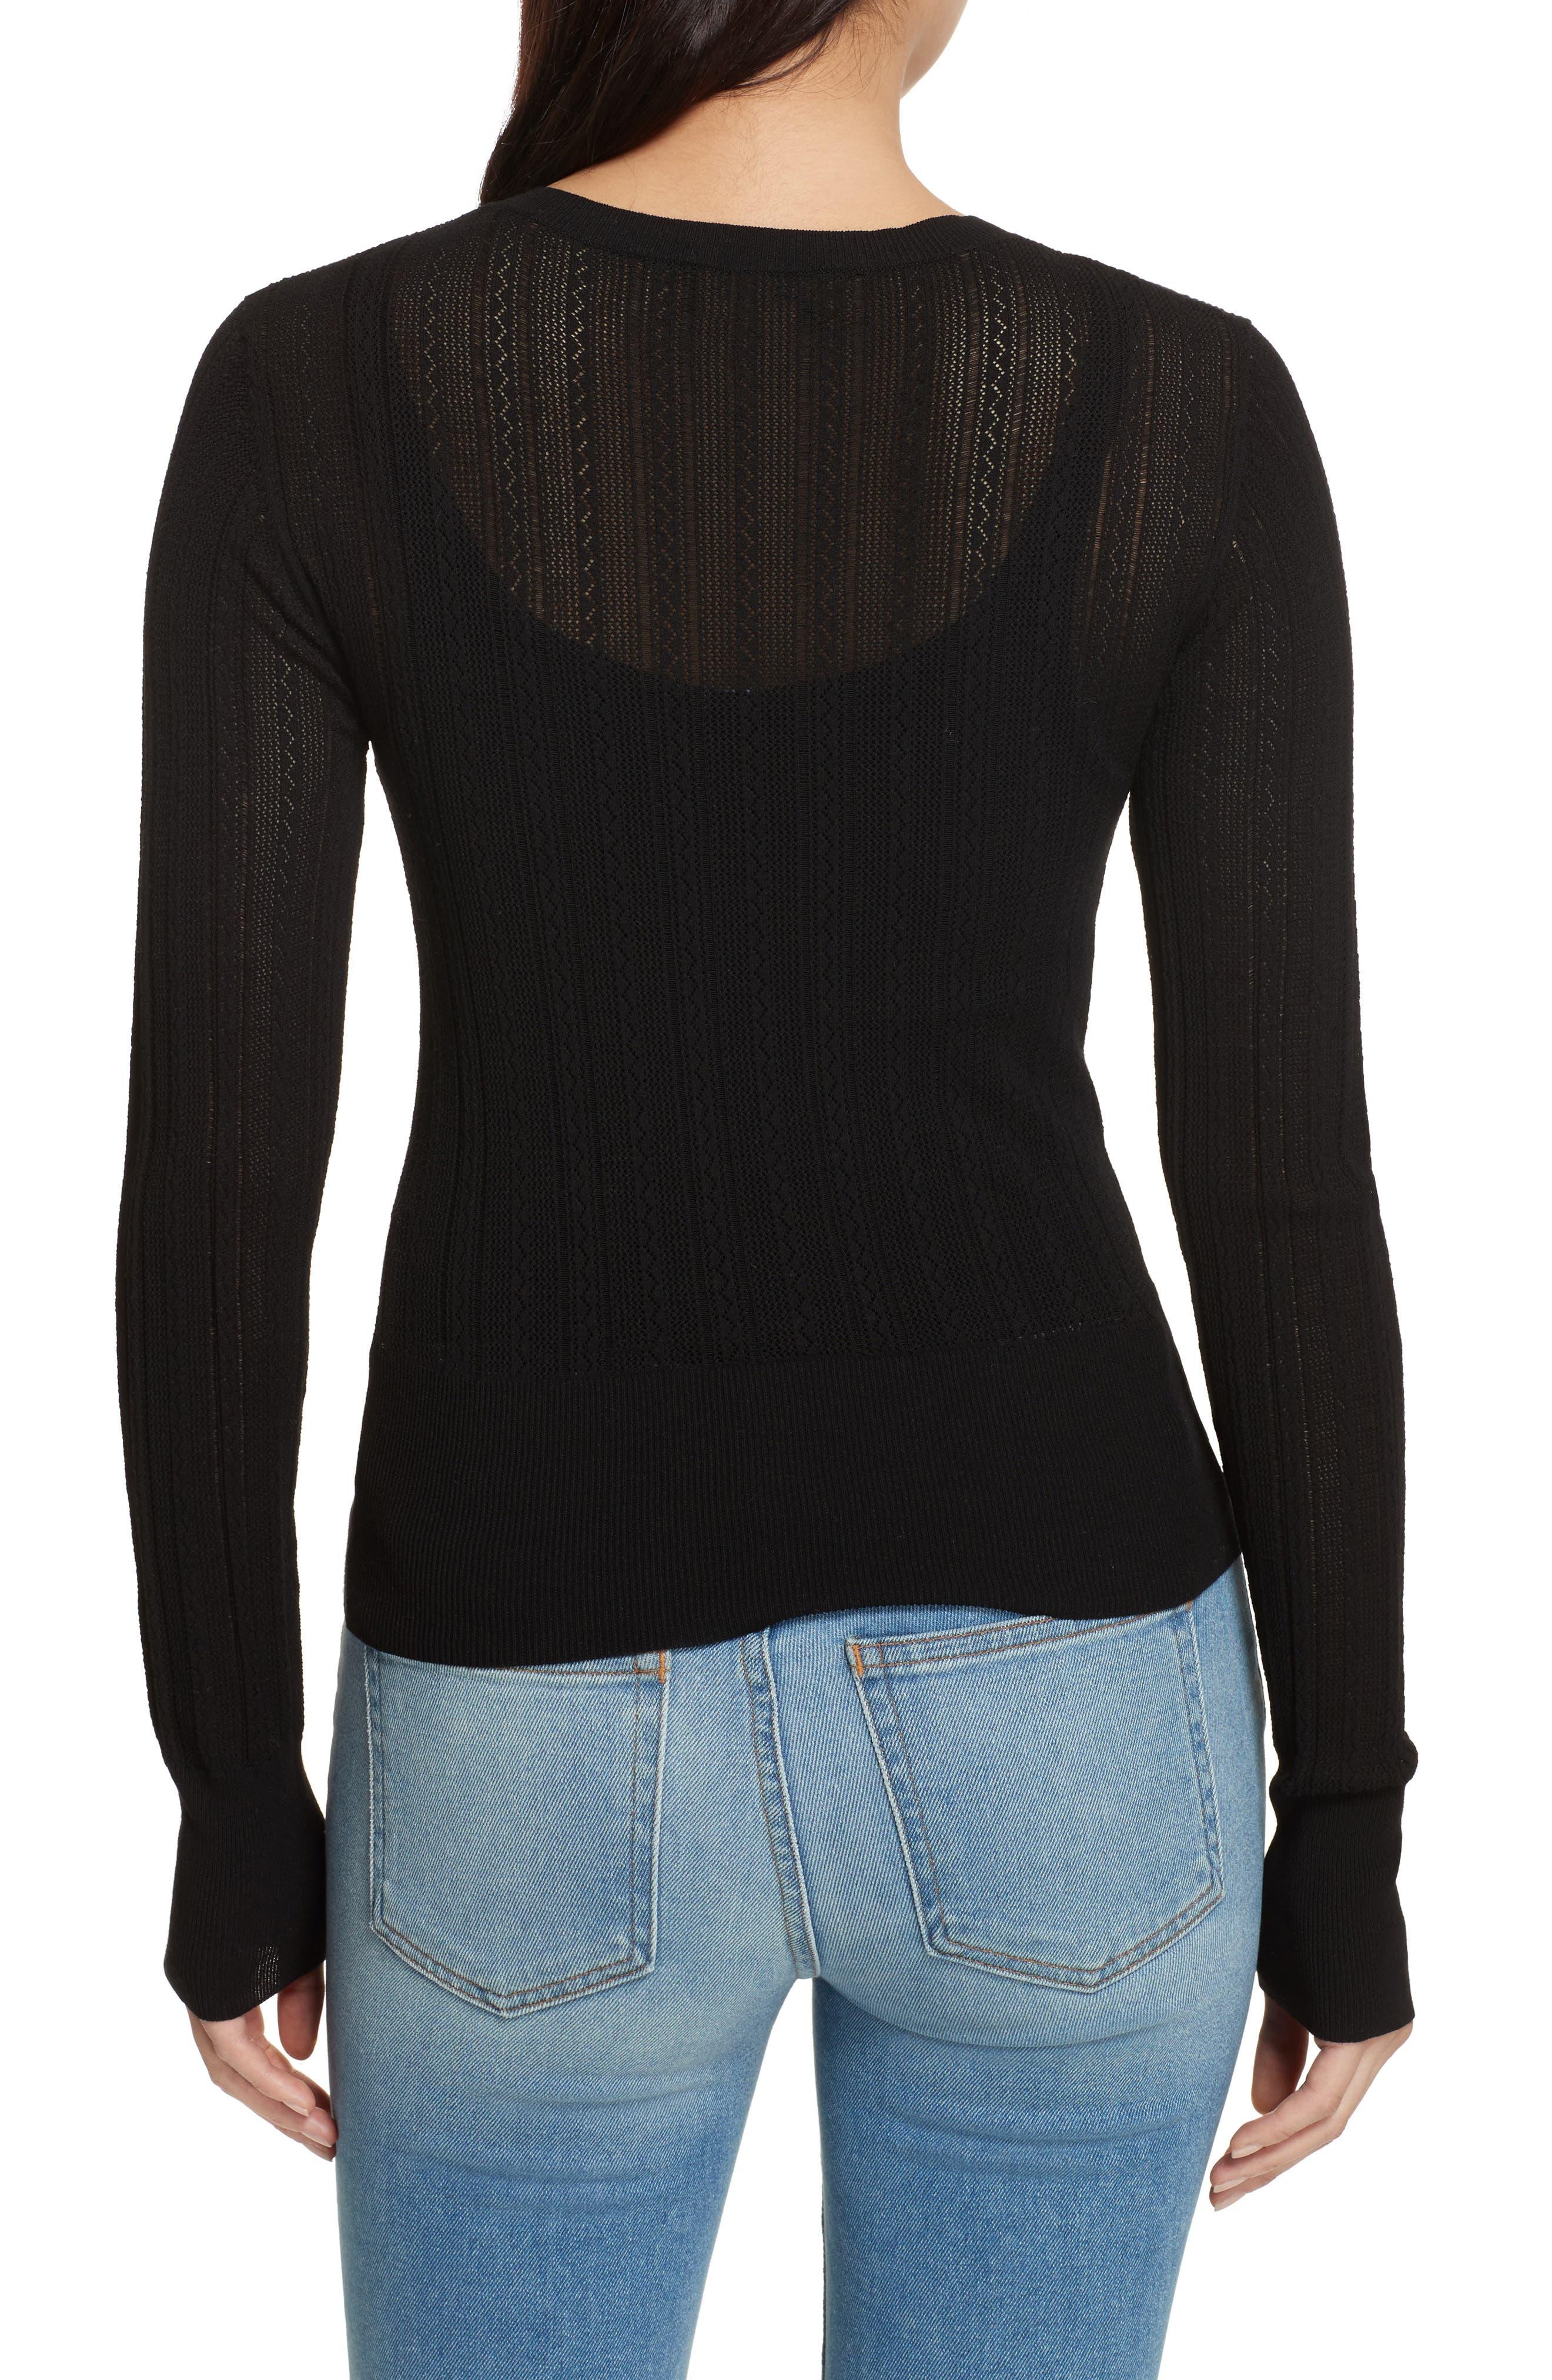 Prosecco Lace Knit Cardigan,                             Alternate thumbnail 2, color,                             Black